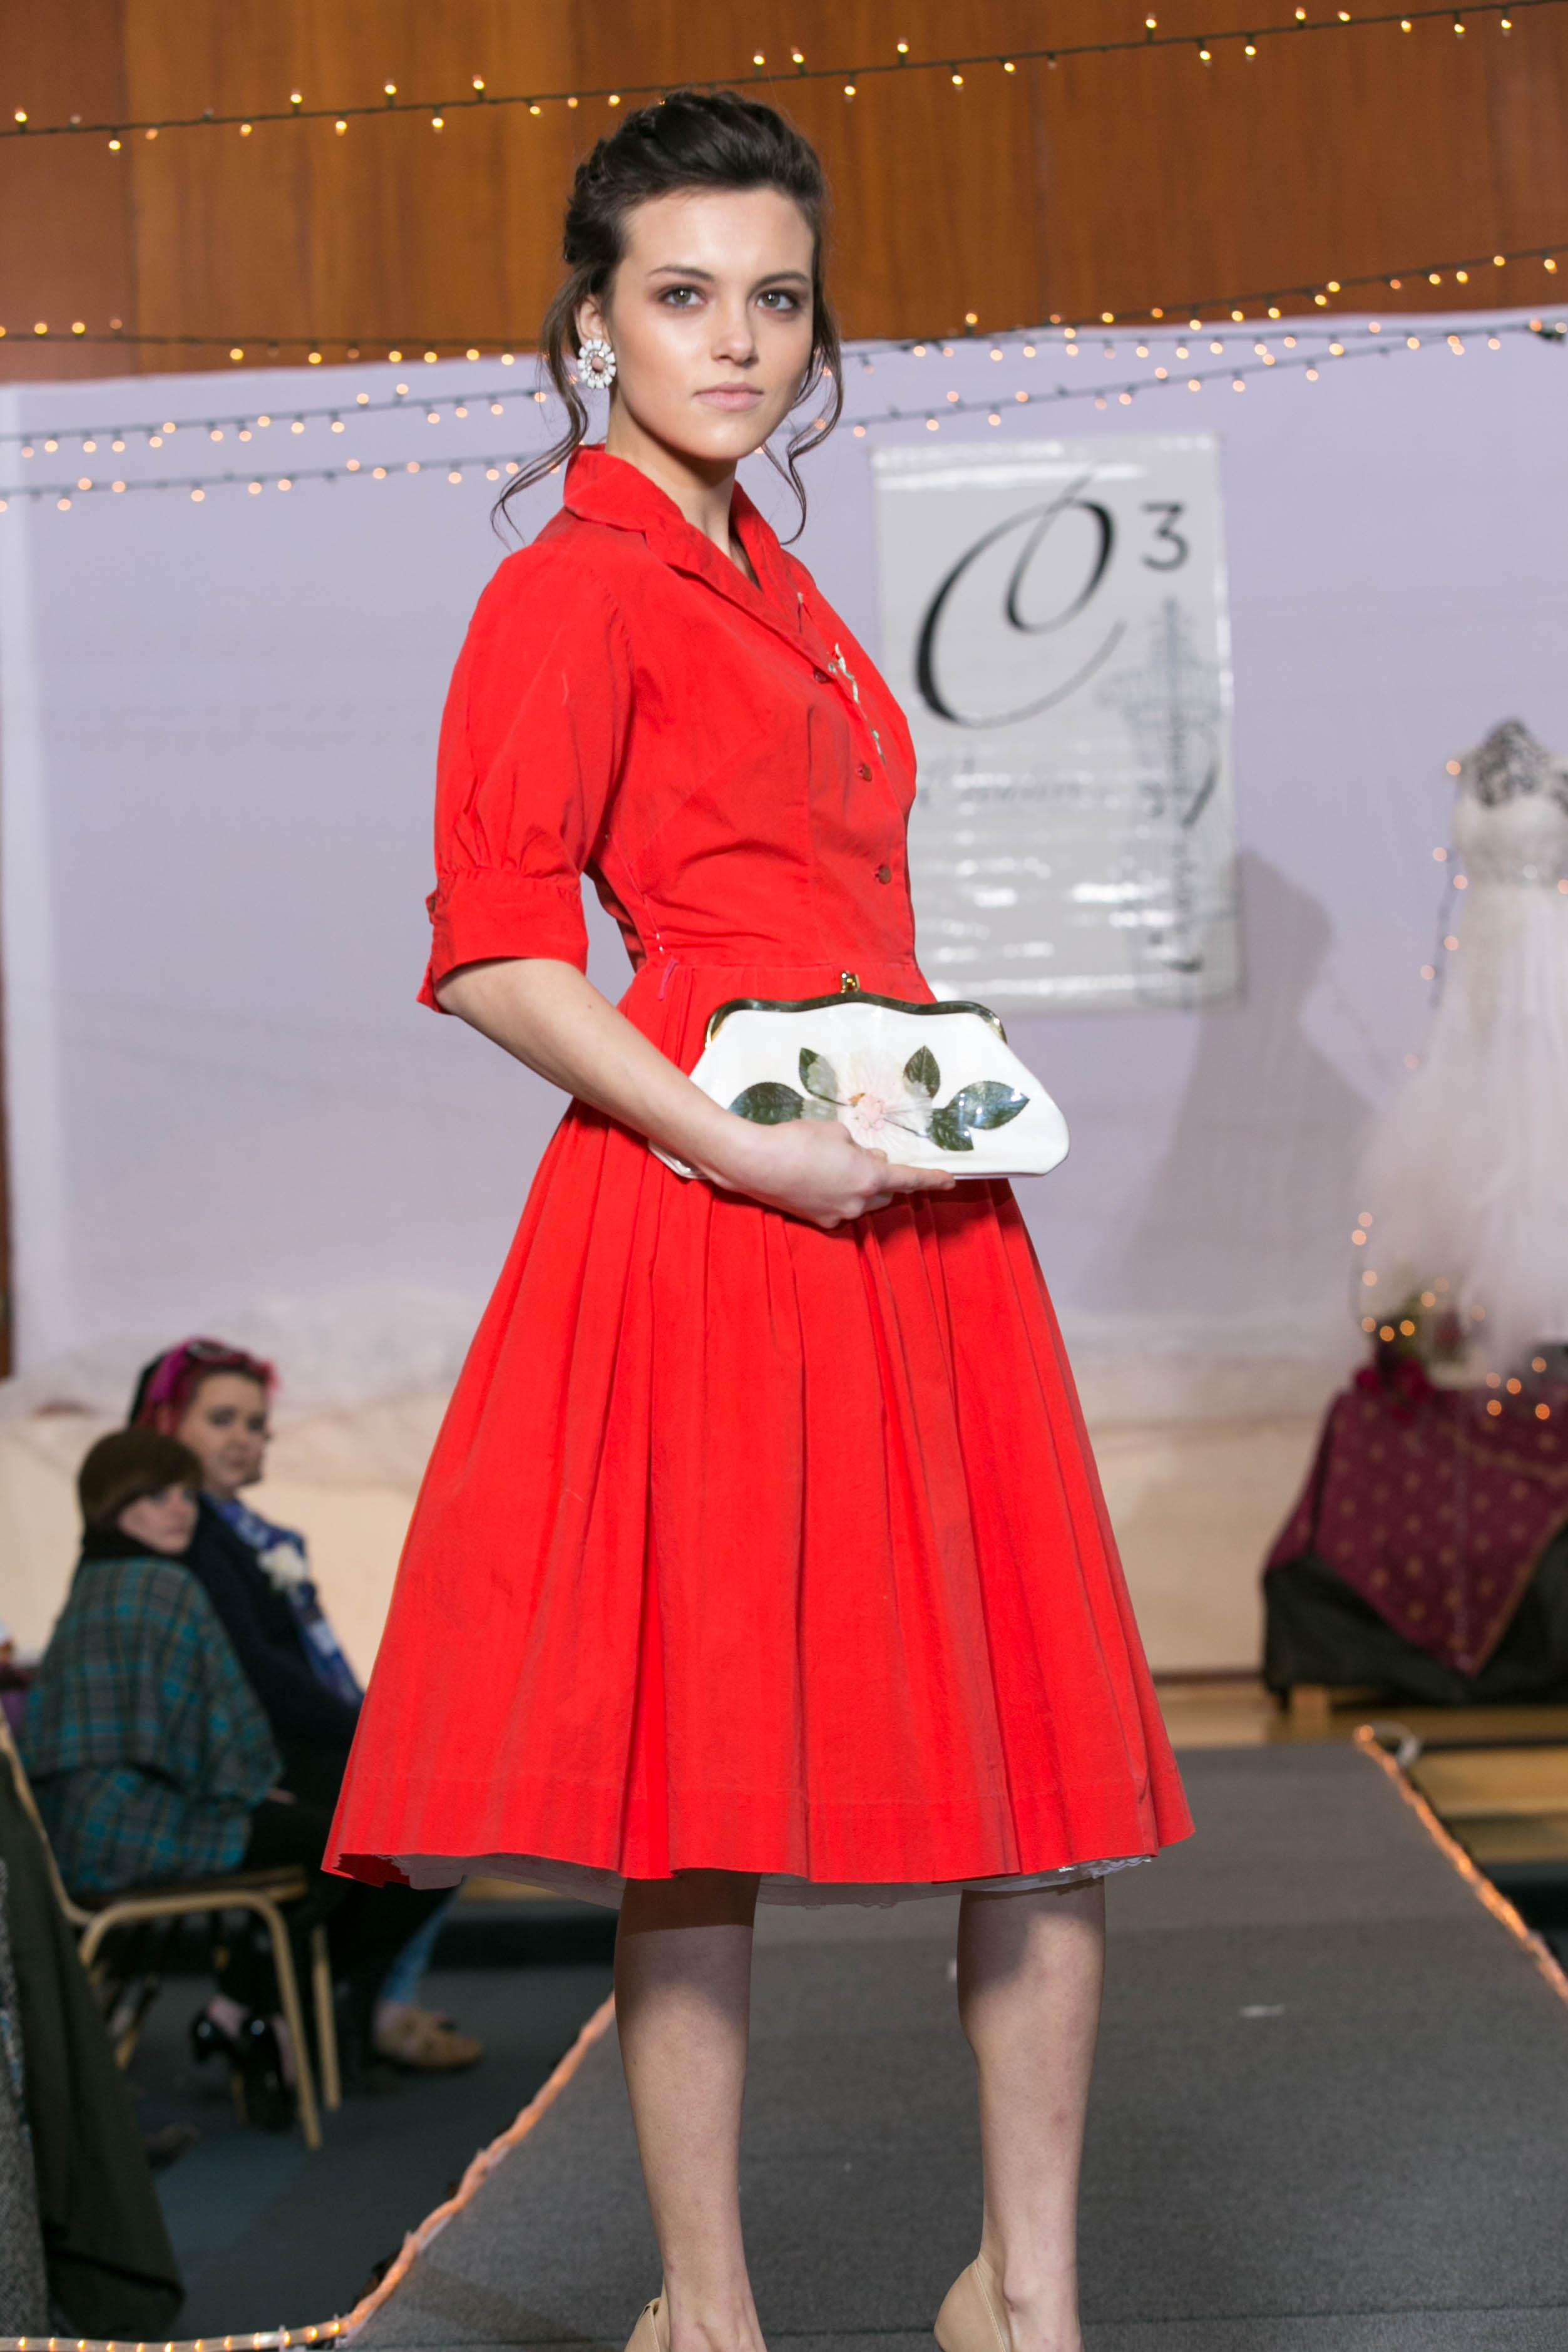 50s rockabilly red dress flower bag